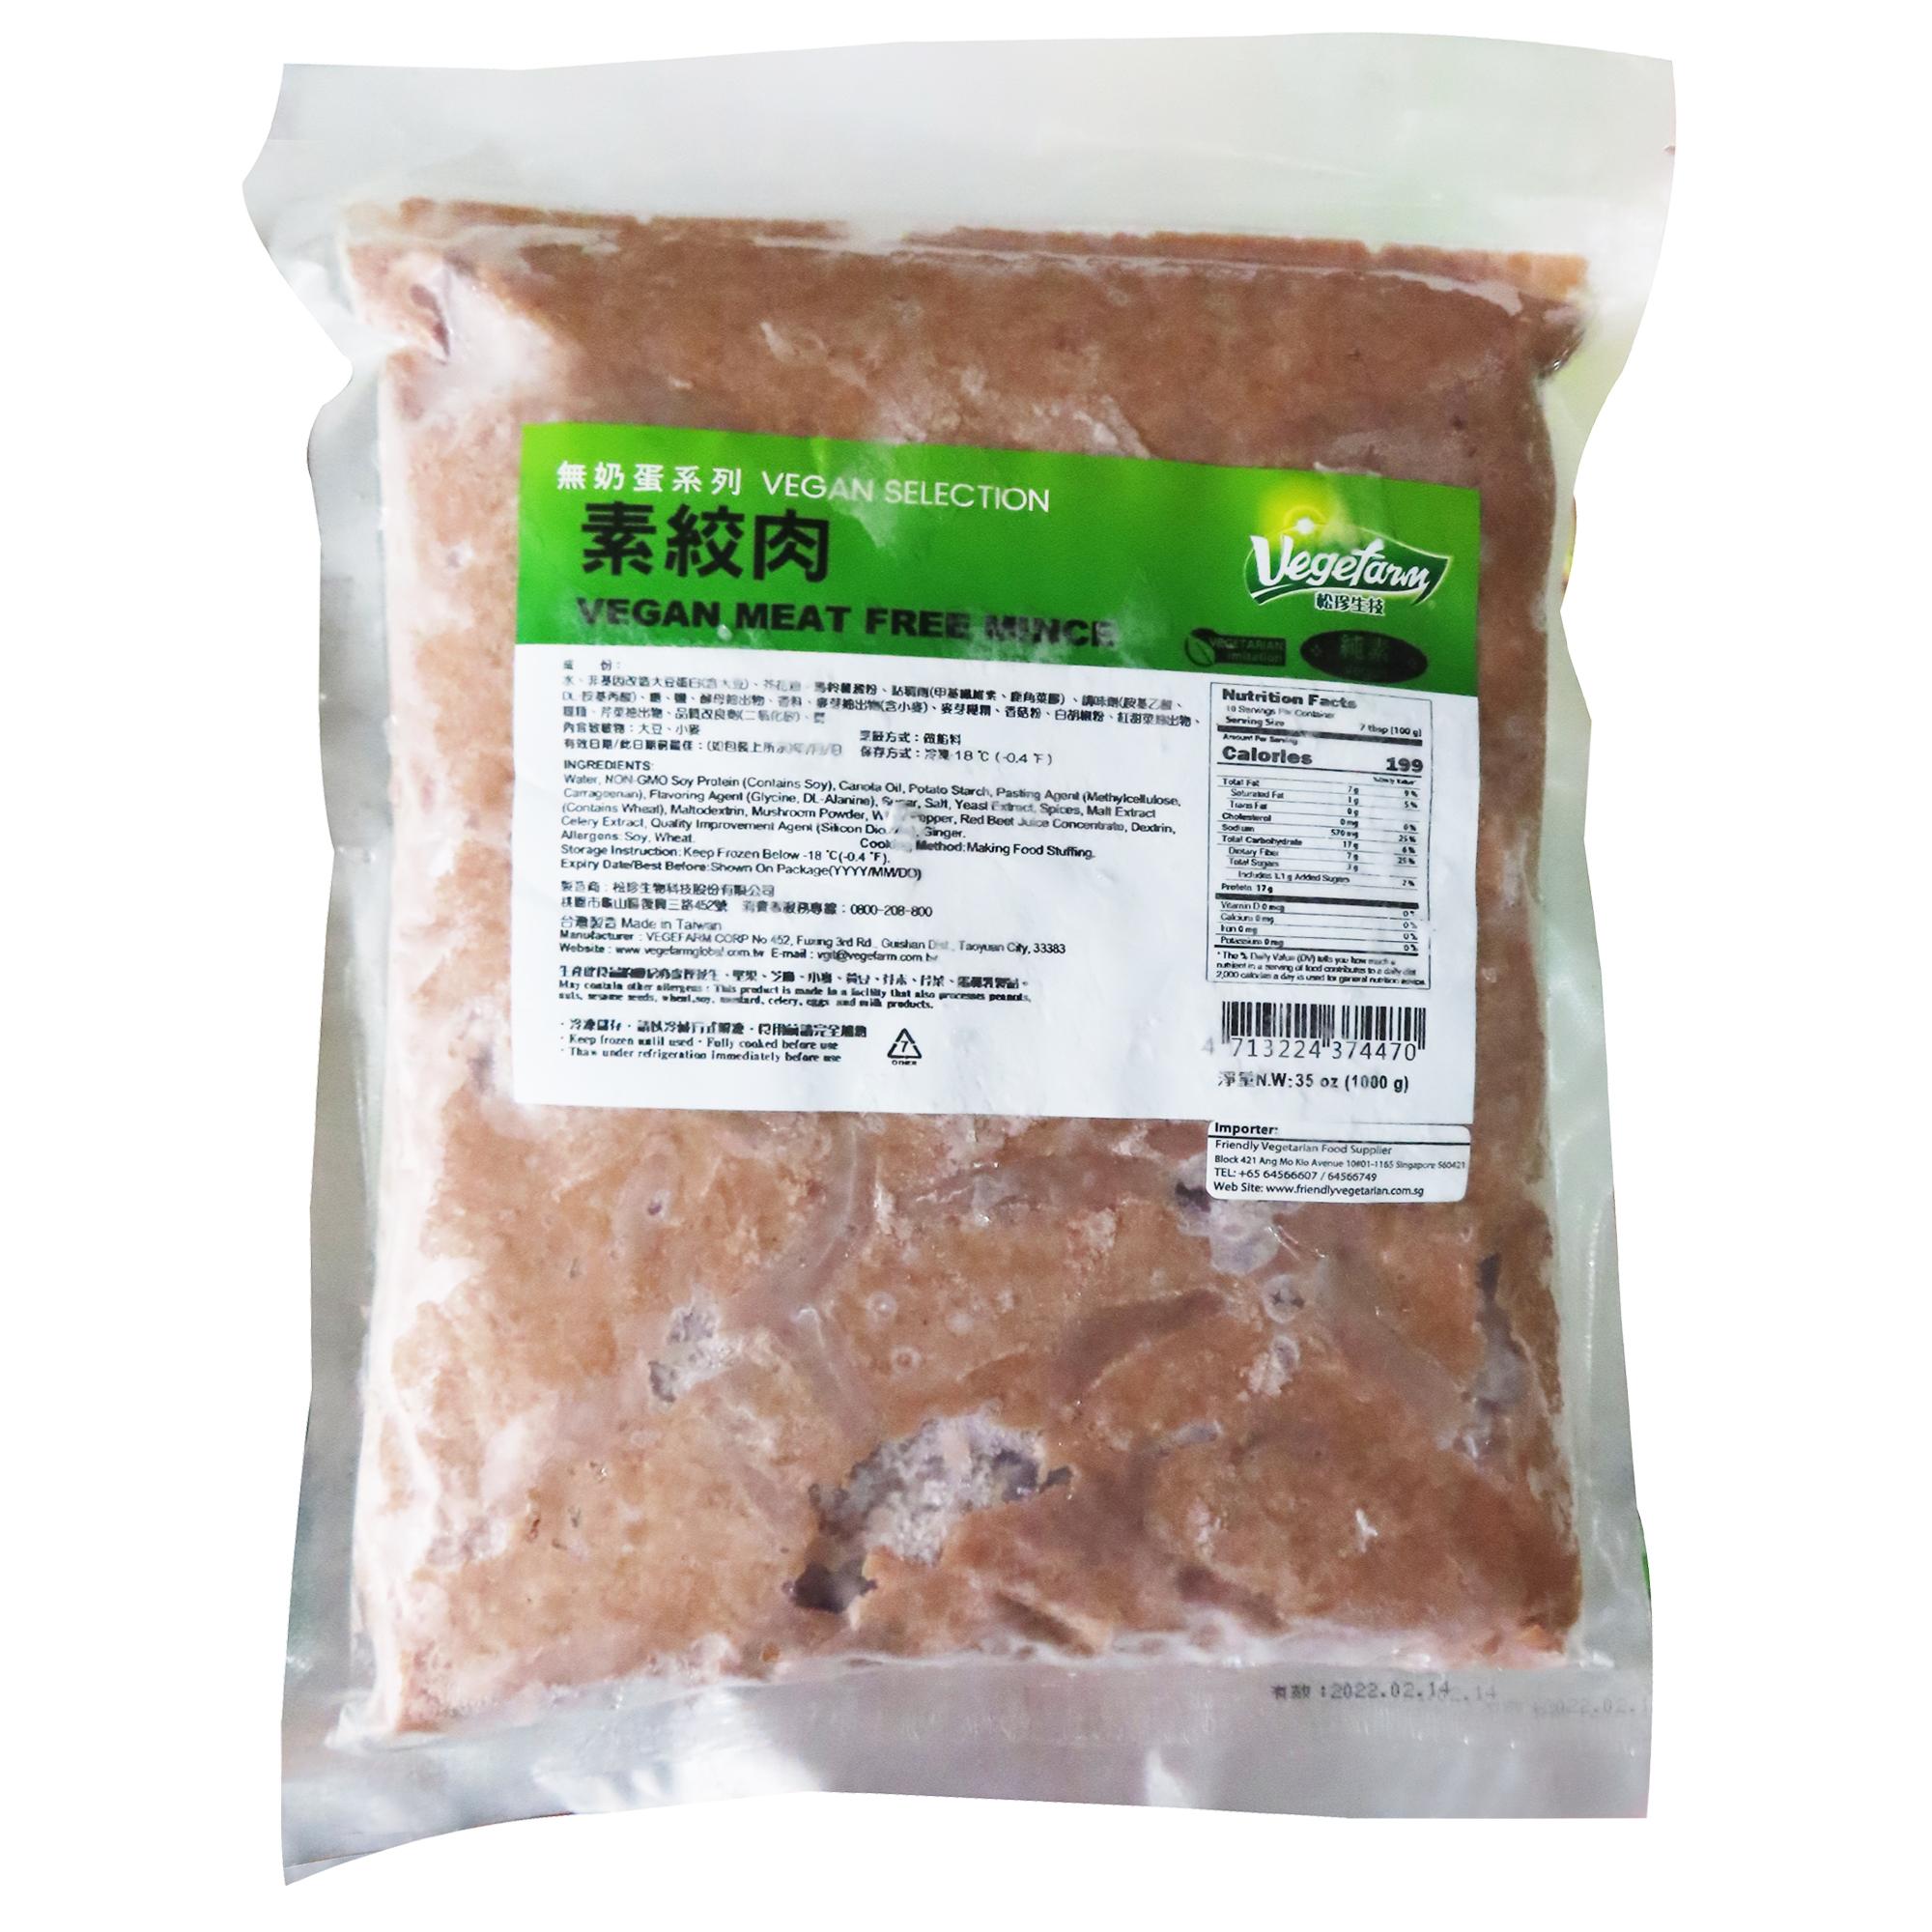 Image Vegefarm Vegan Meat Free Mince 松珍 - 素絞肉(純素)1000grams